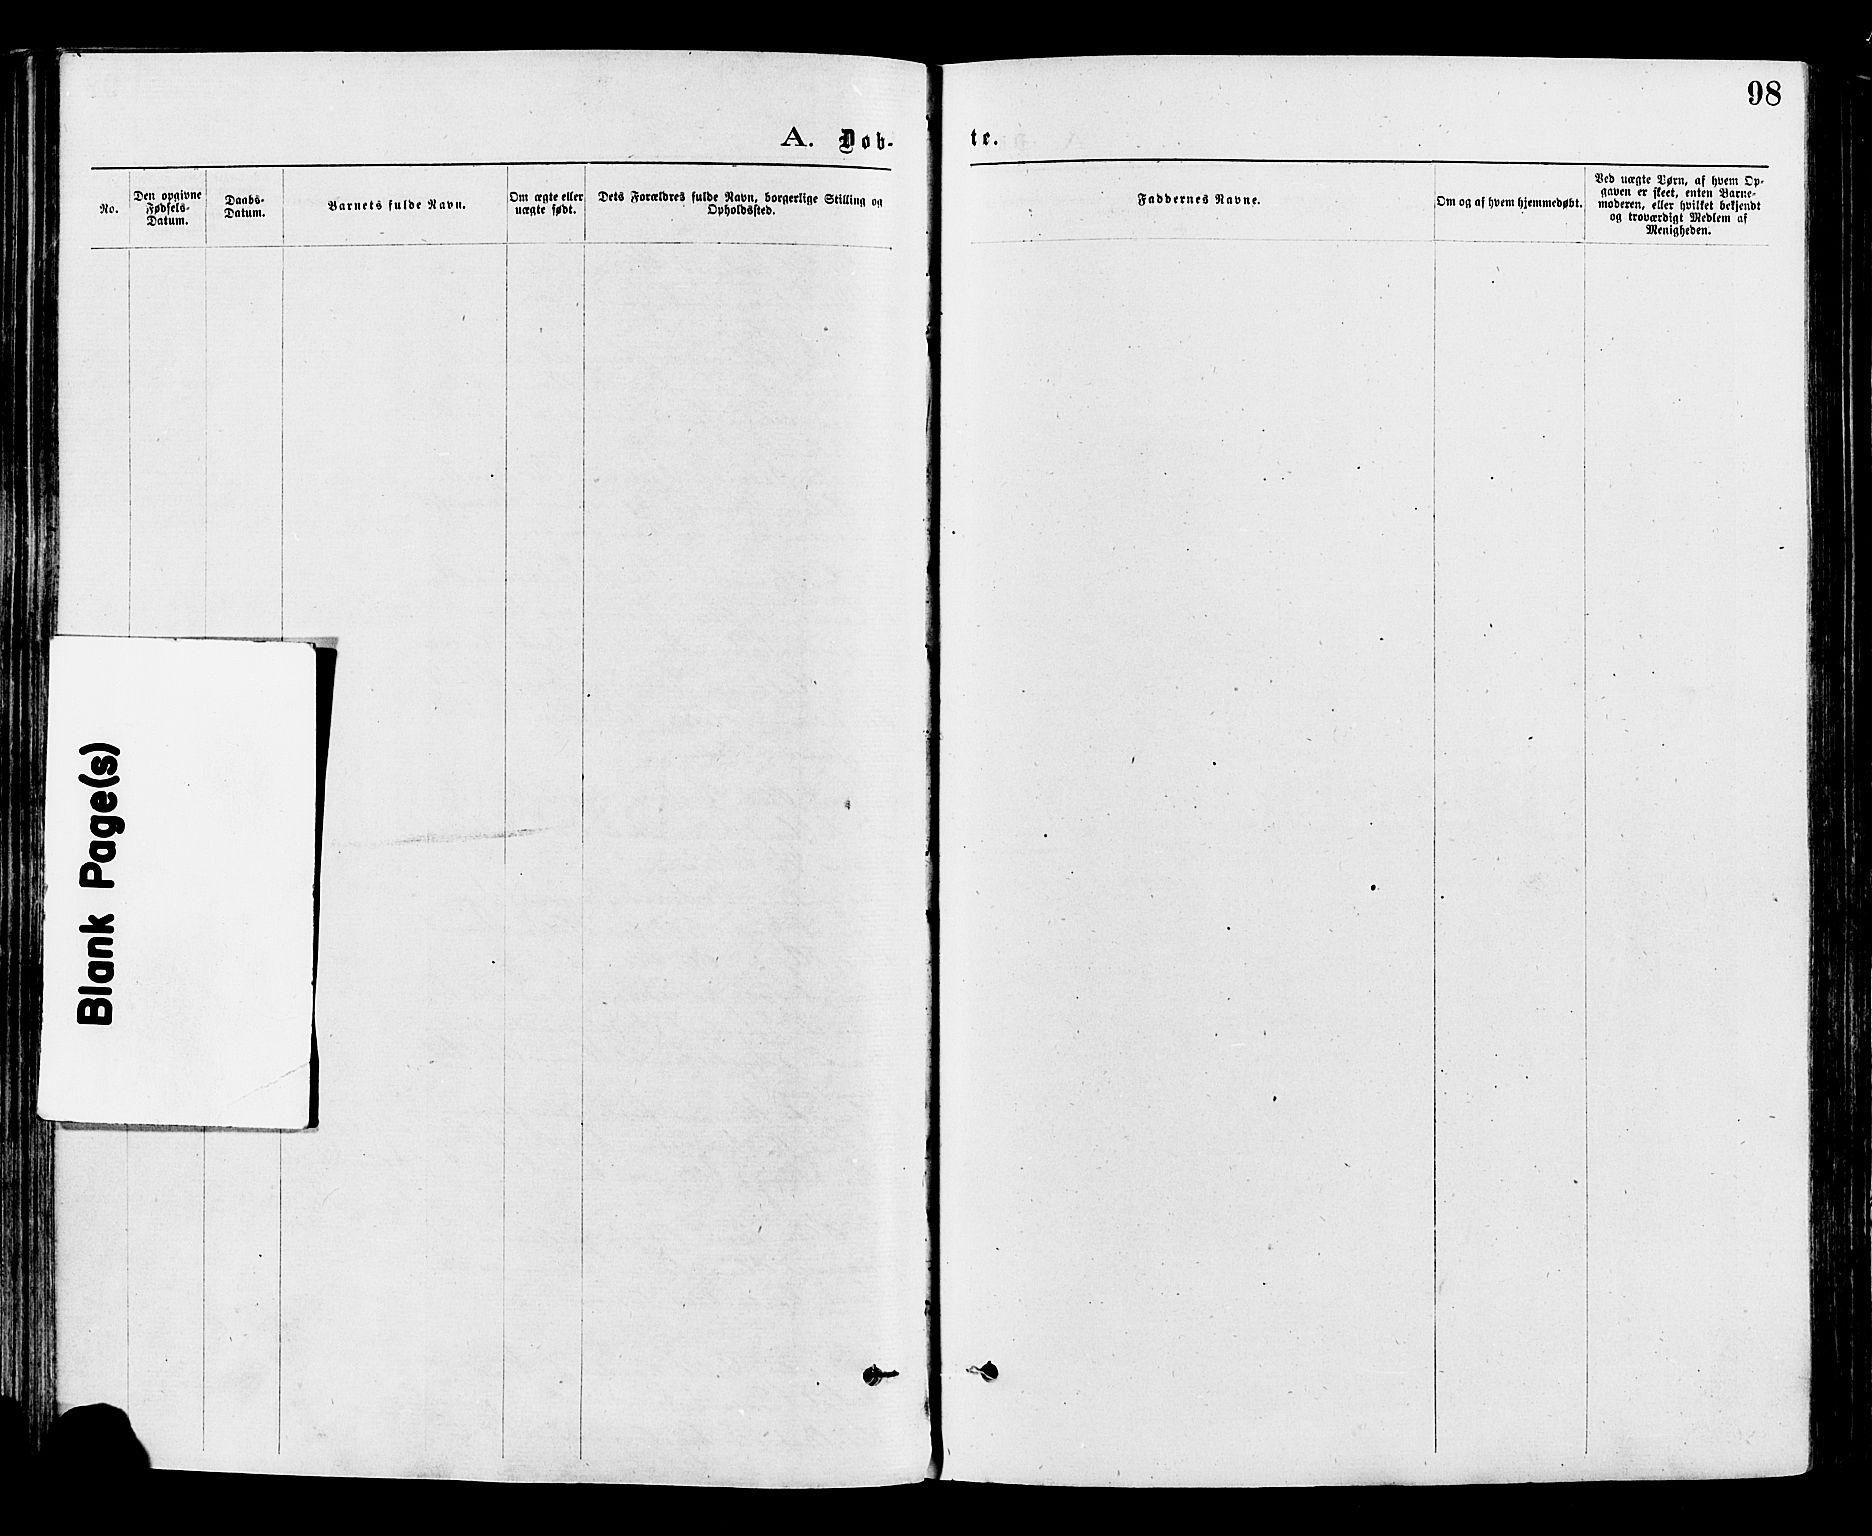 SAH, Nord-Aurdal prestekontor, Ministerialbok nr. 9, 1876-1882, s. 98